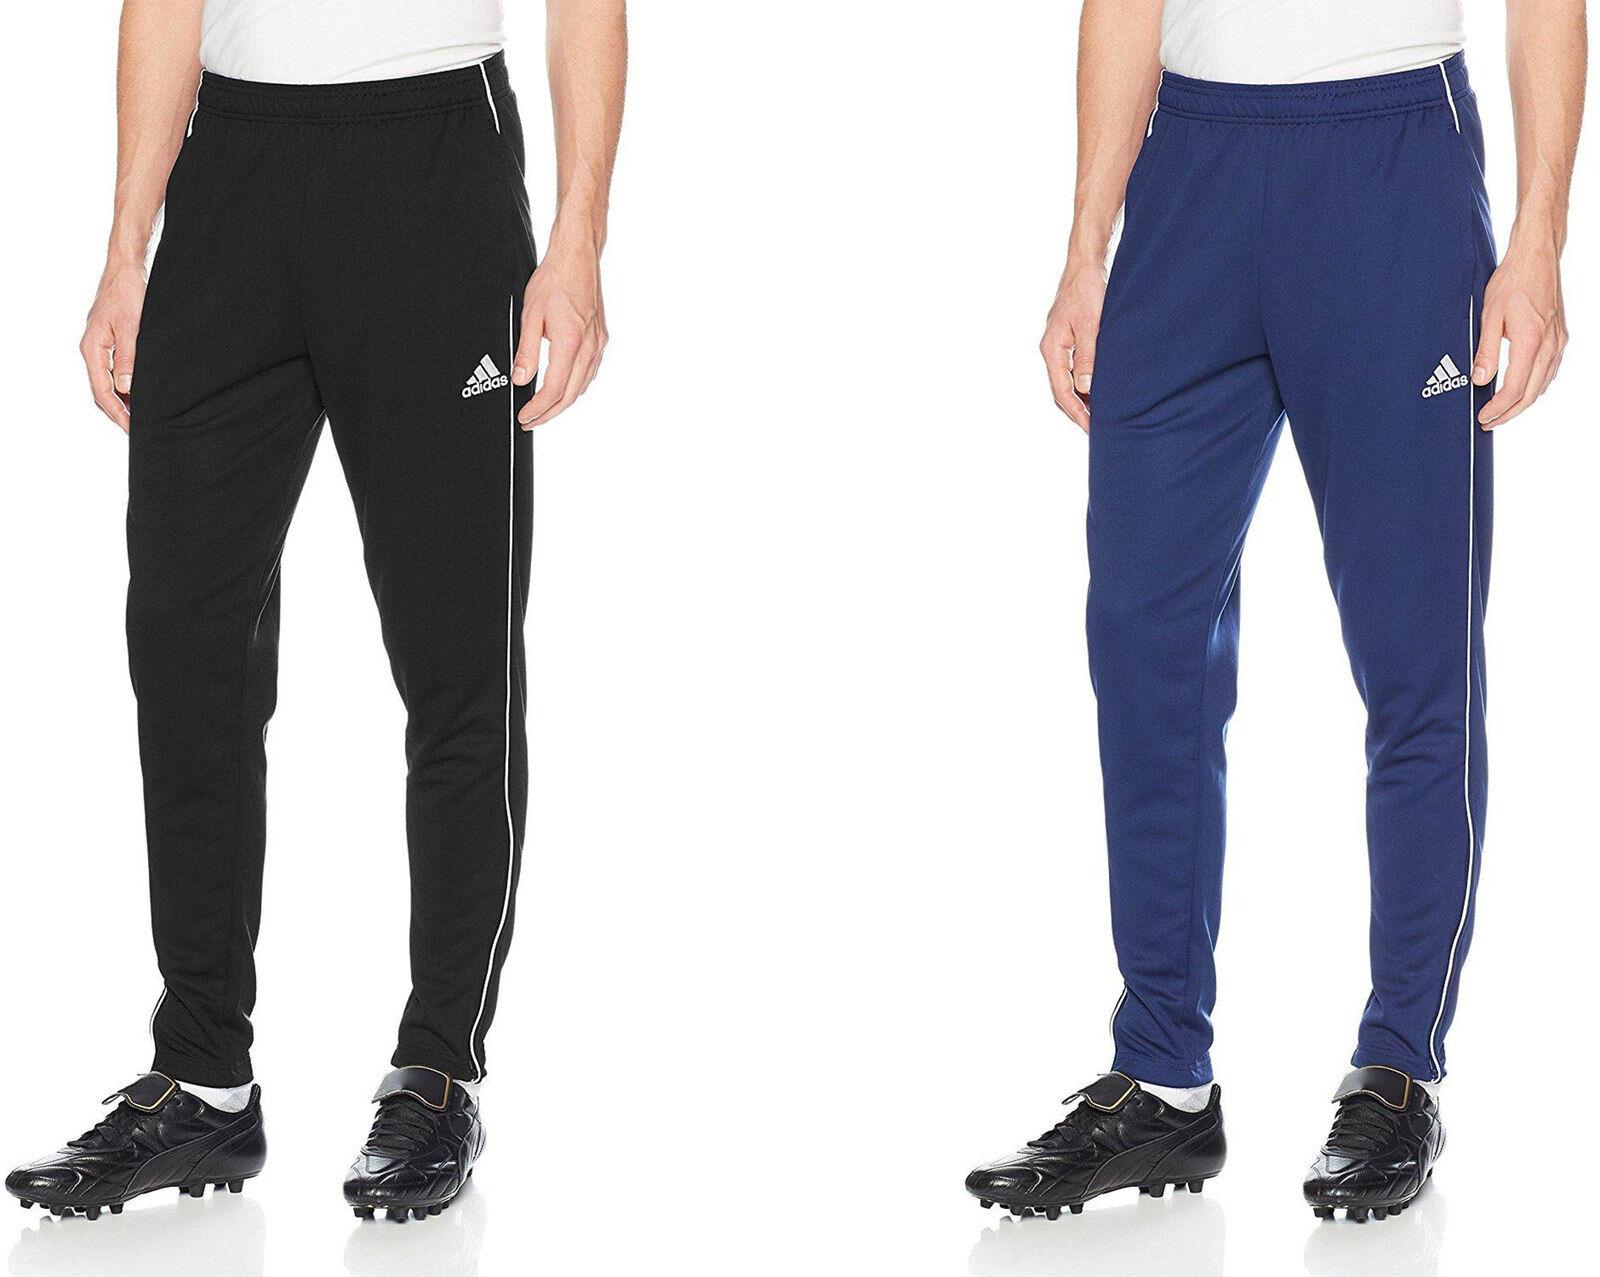 f11a0b2e2 adidas Men's Soccer Core 18 Training Pants | eBay